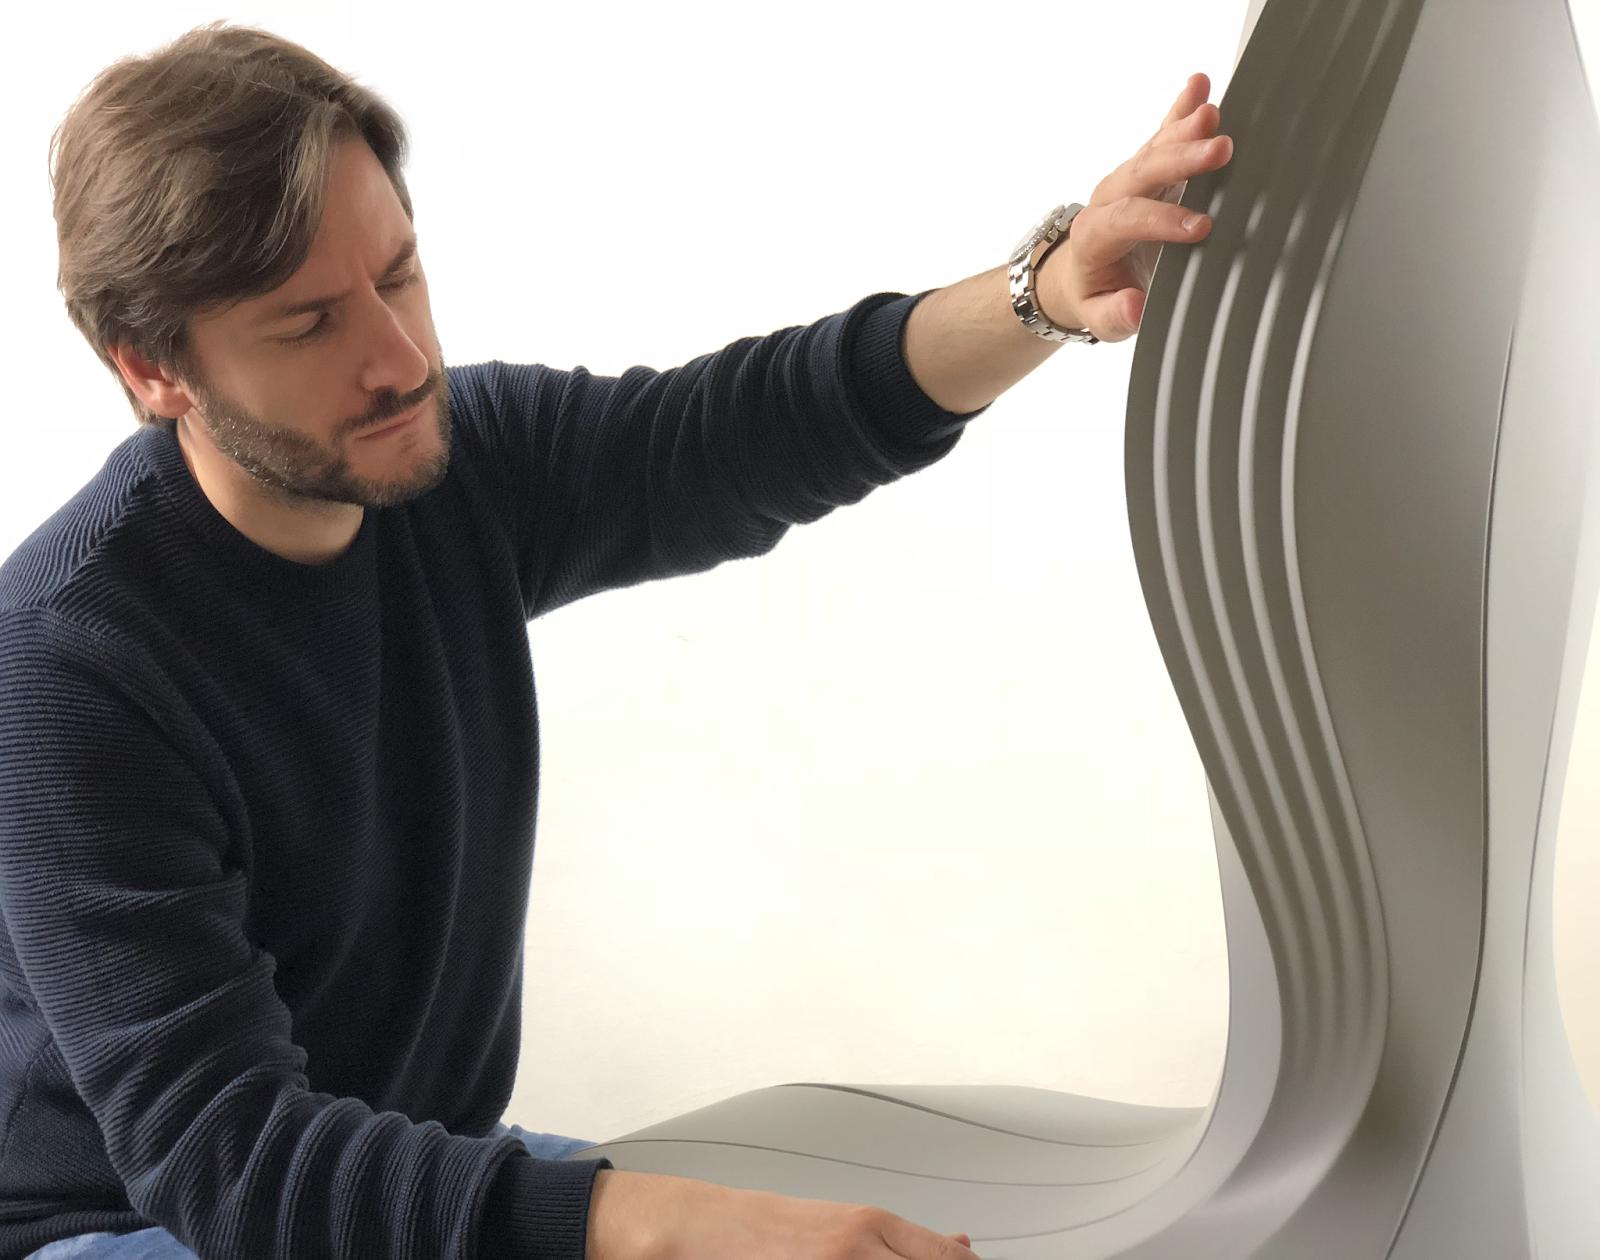 Solving Complexities Through Computational Tools / Arturo